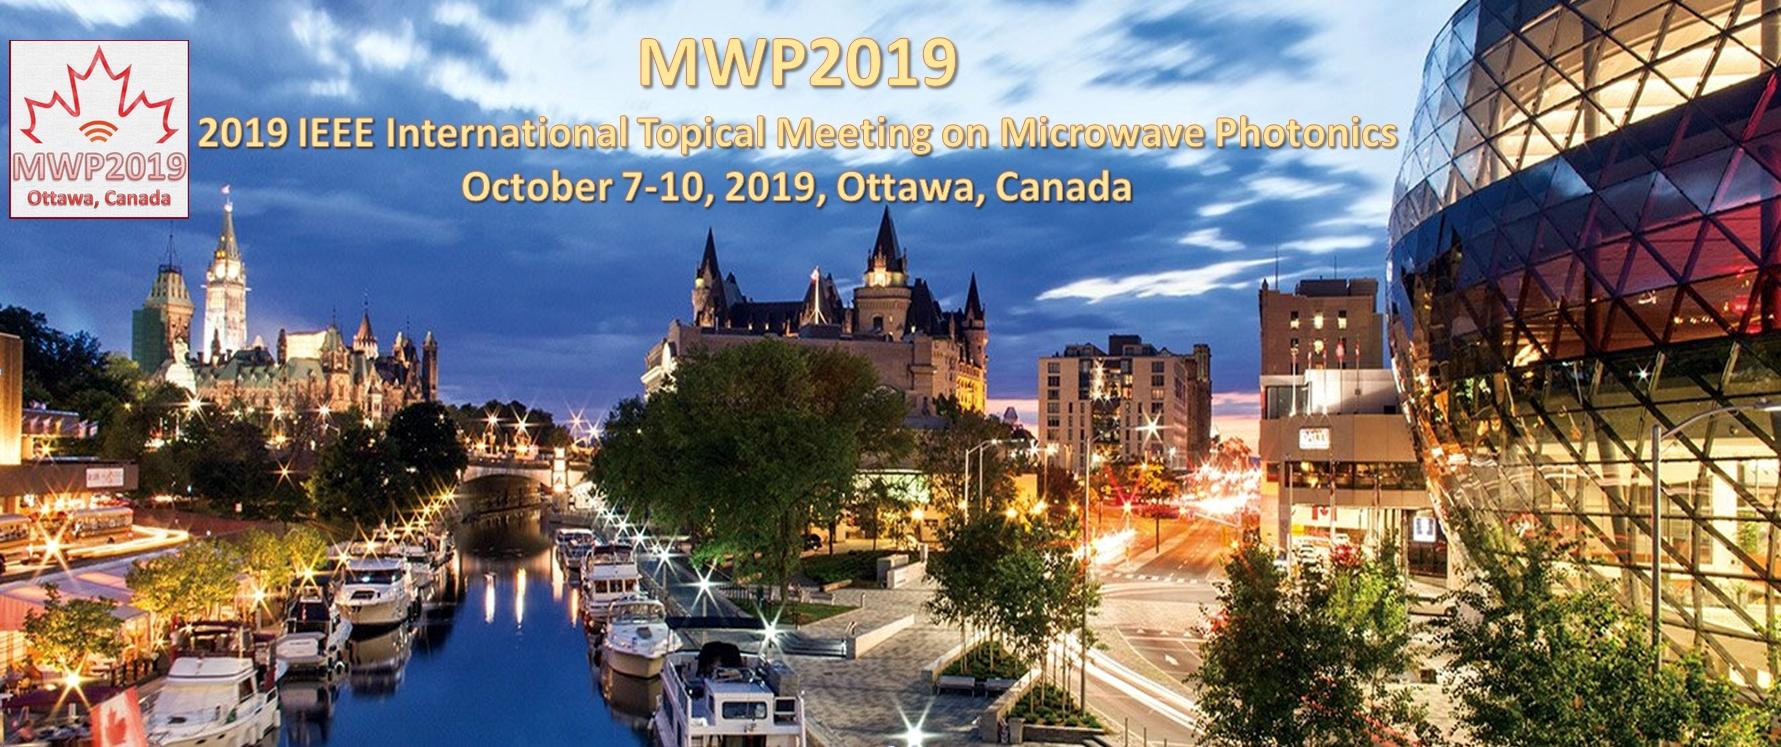 MWP2019-2019 INTERNATIONAL TOPICAL MEETING ON MICROWAVE